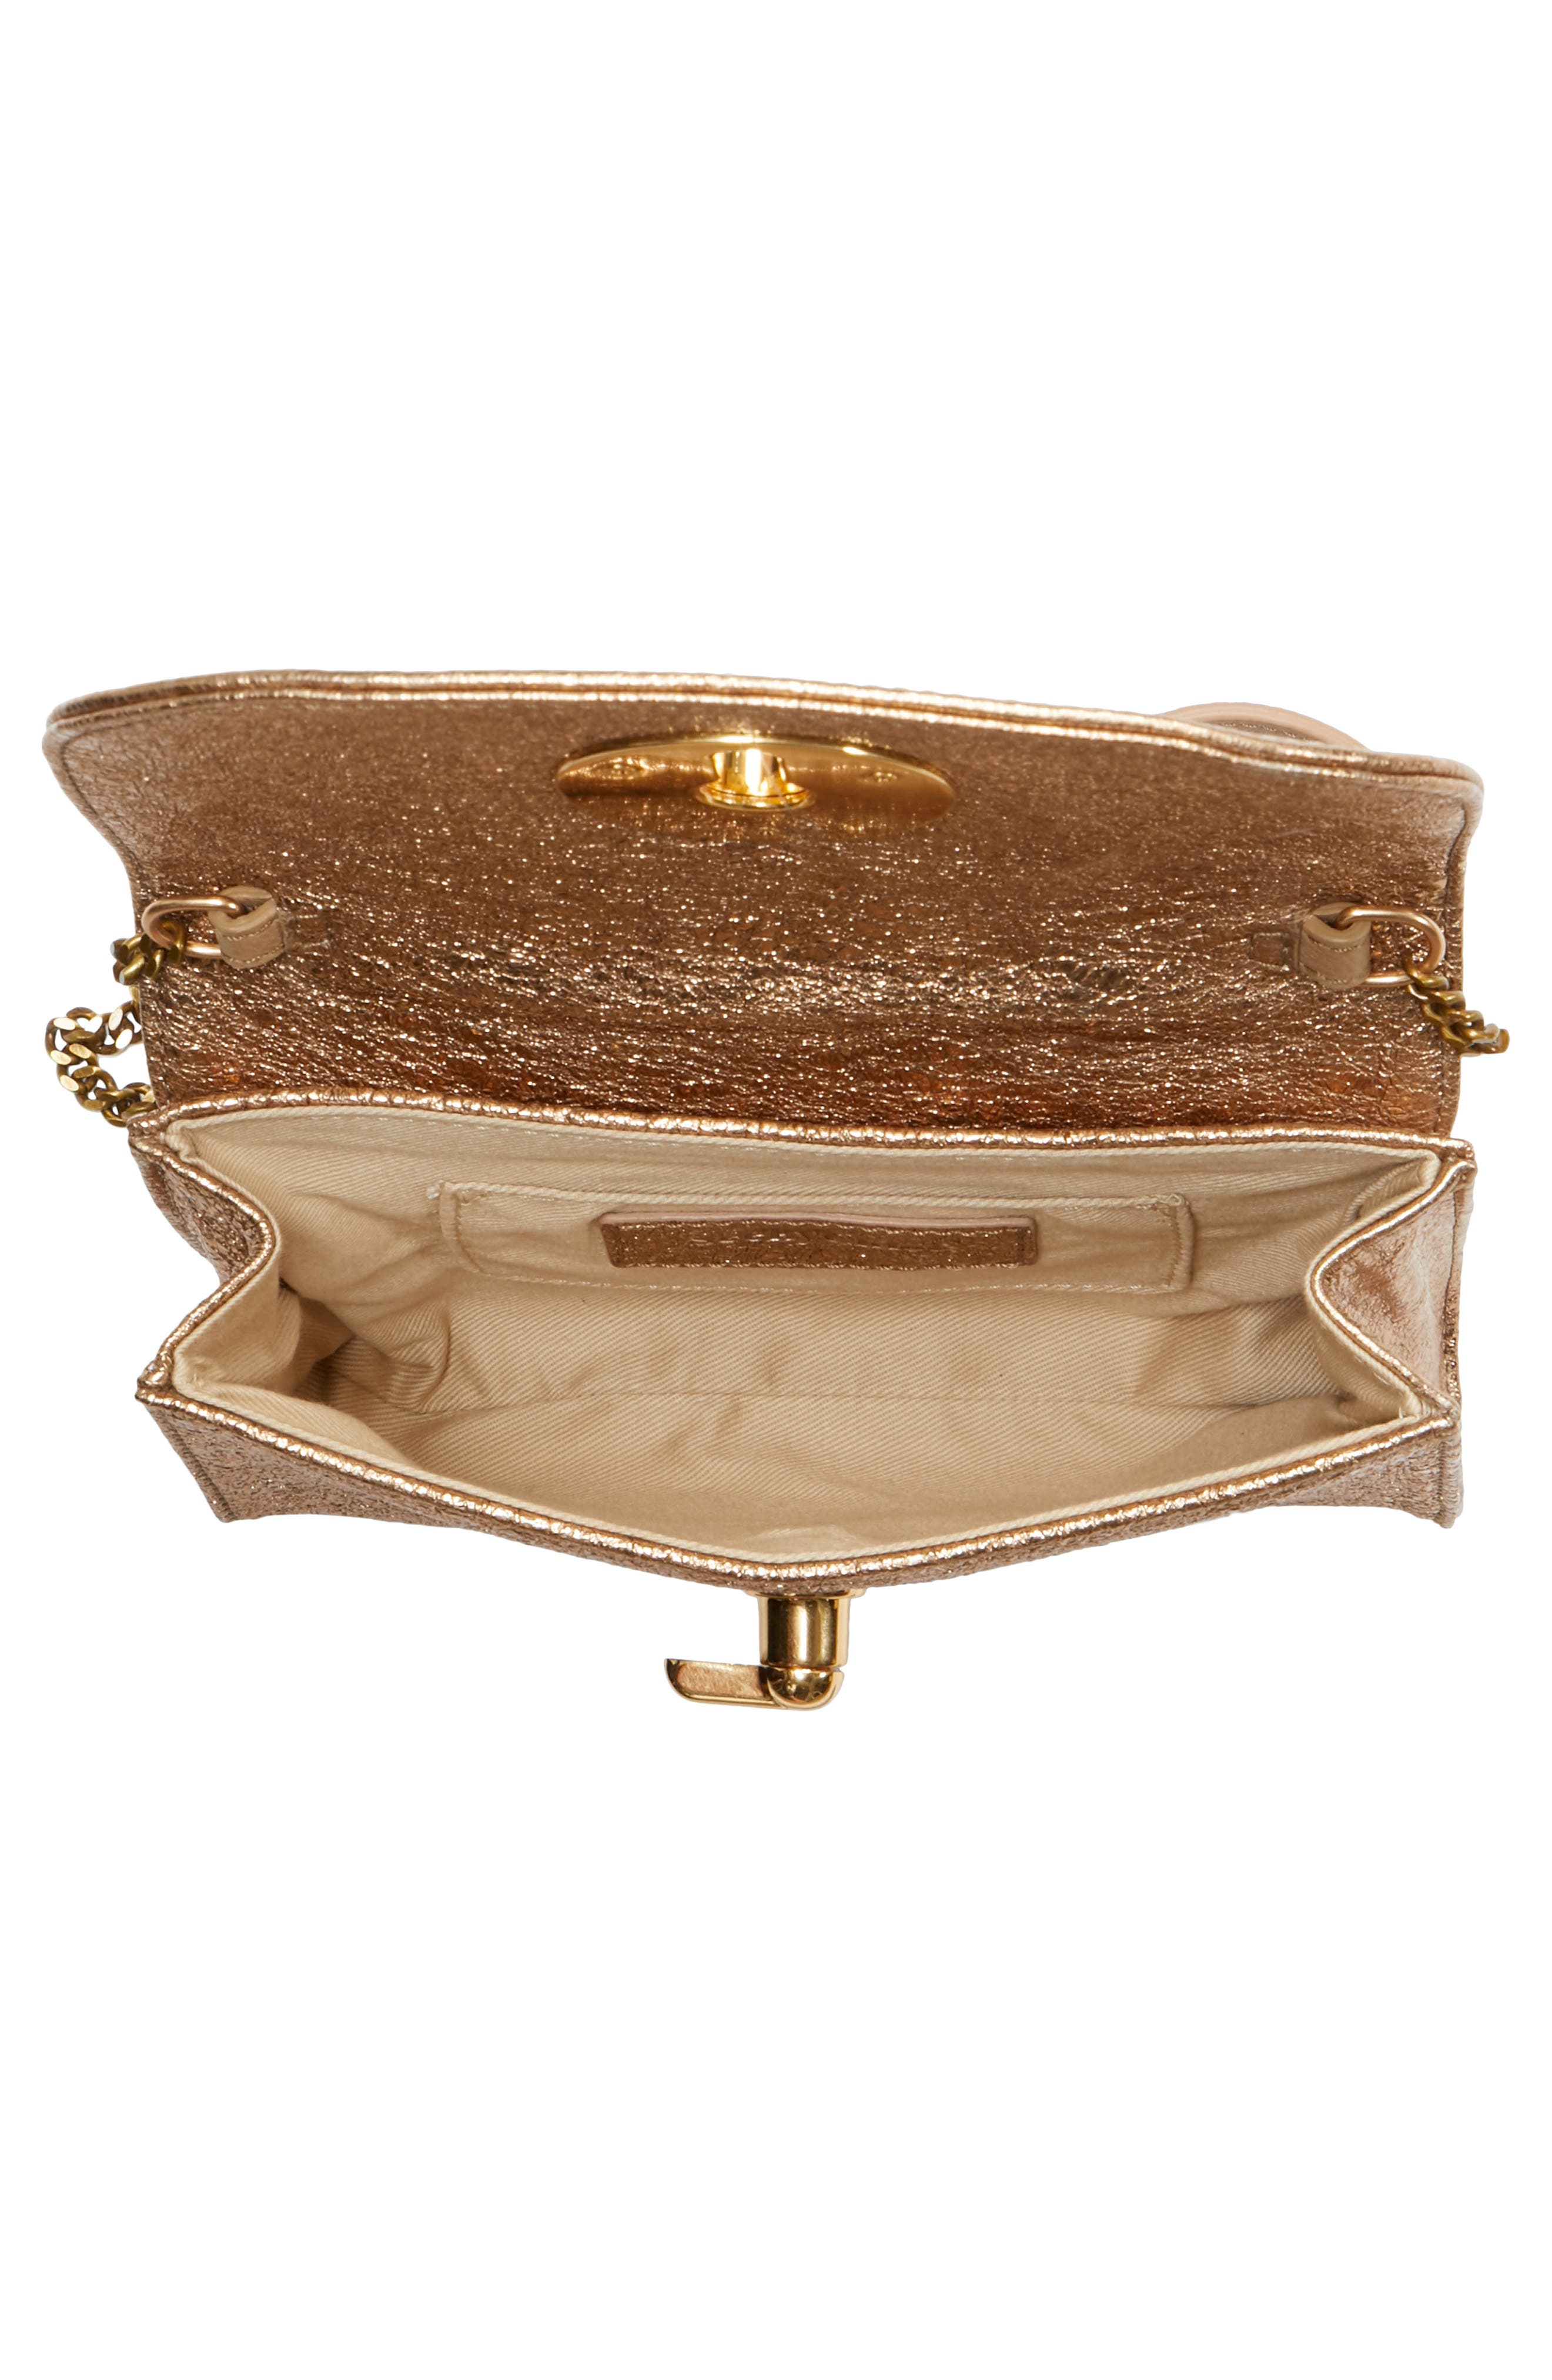 Mini Lois Metallic Calfskin Leather Crossbody Bag,                             Alternate thumbnail 4, color,                             SANDY BROWN